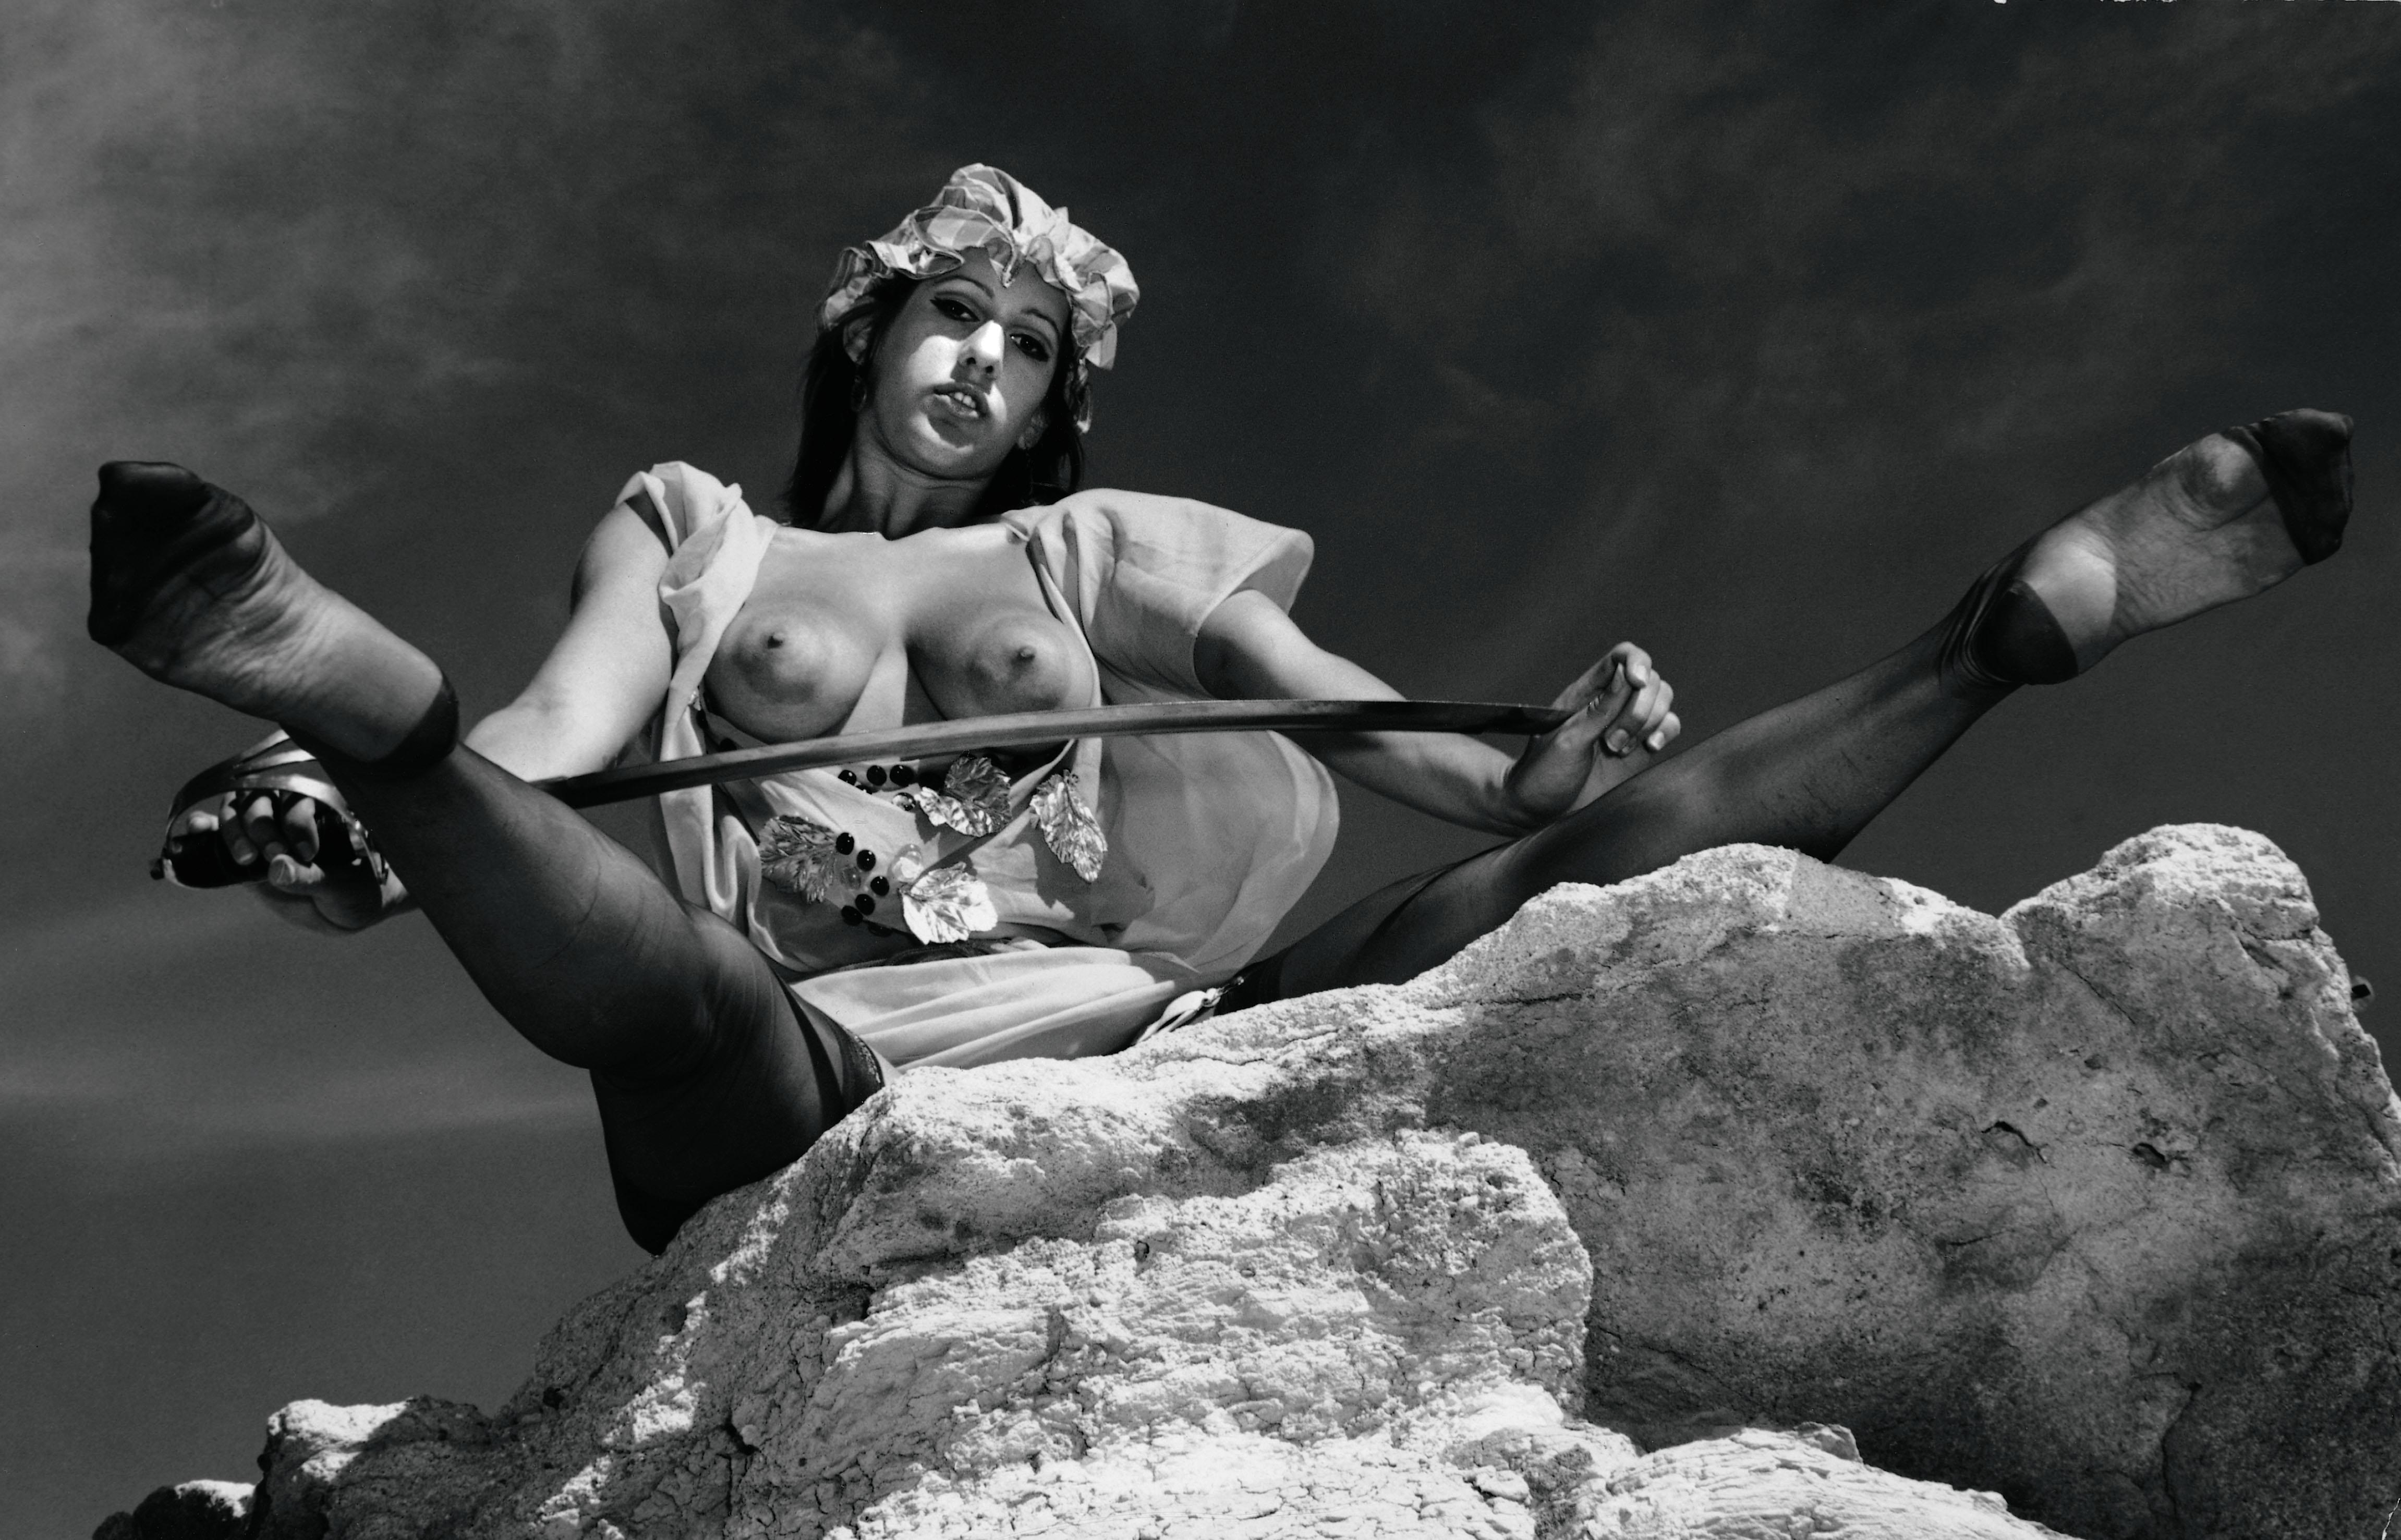 кино трусики революции эротика - 2